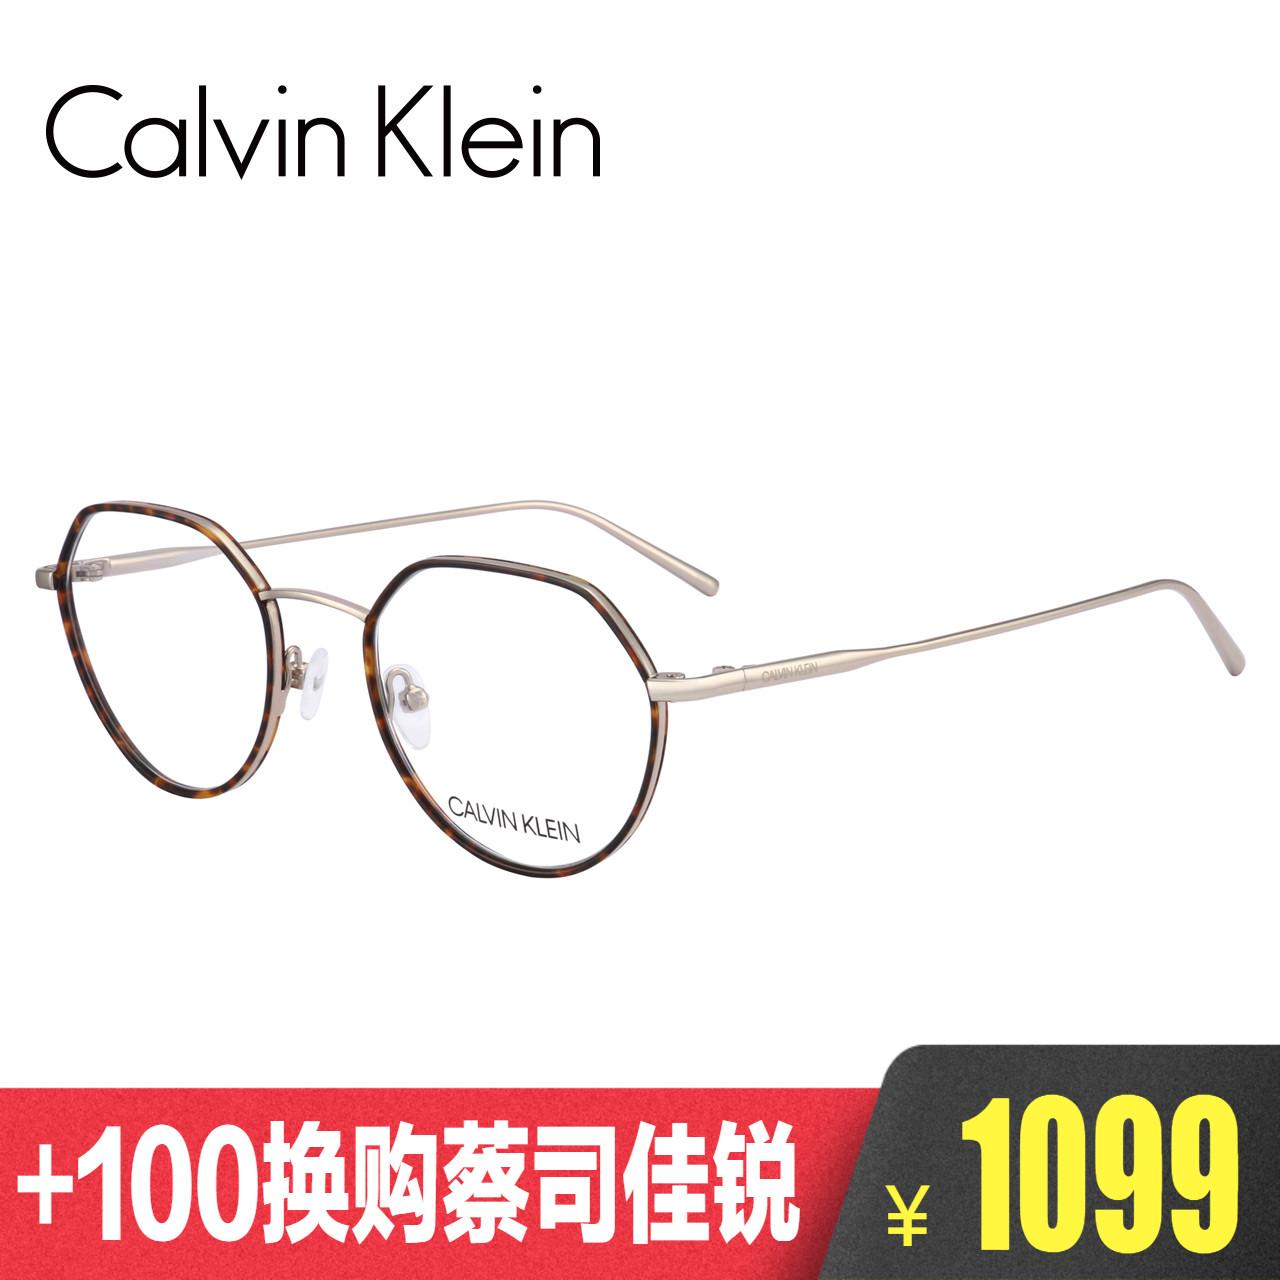 CK新款眼镜框 男女时尚韩版多边形潮人金属眼镜近视眼镜架 CK5470